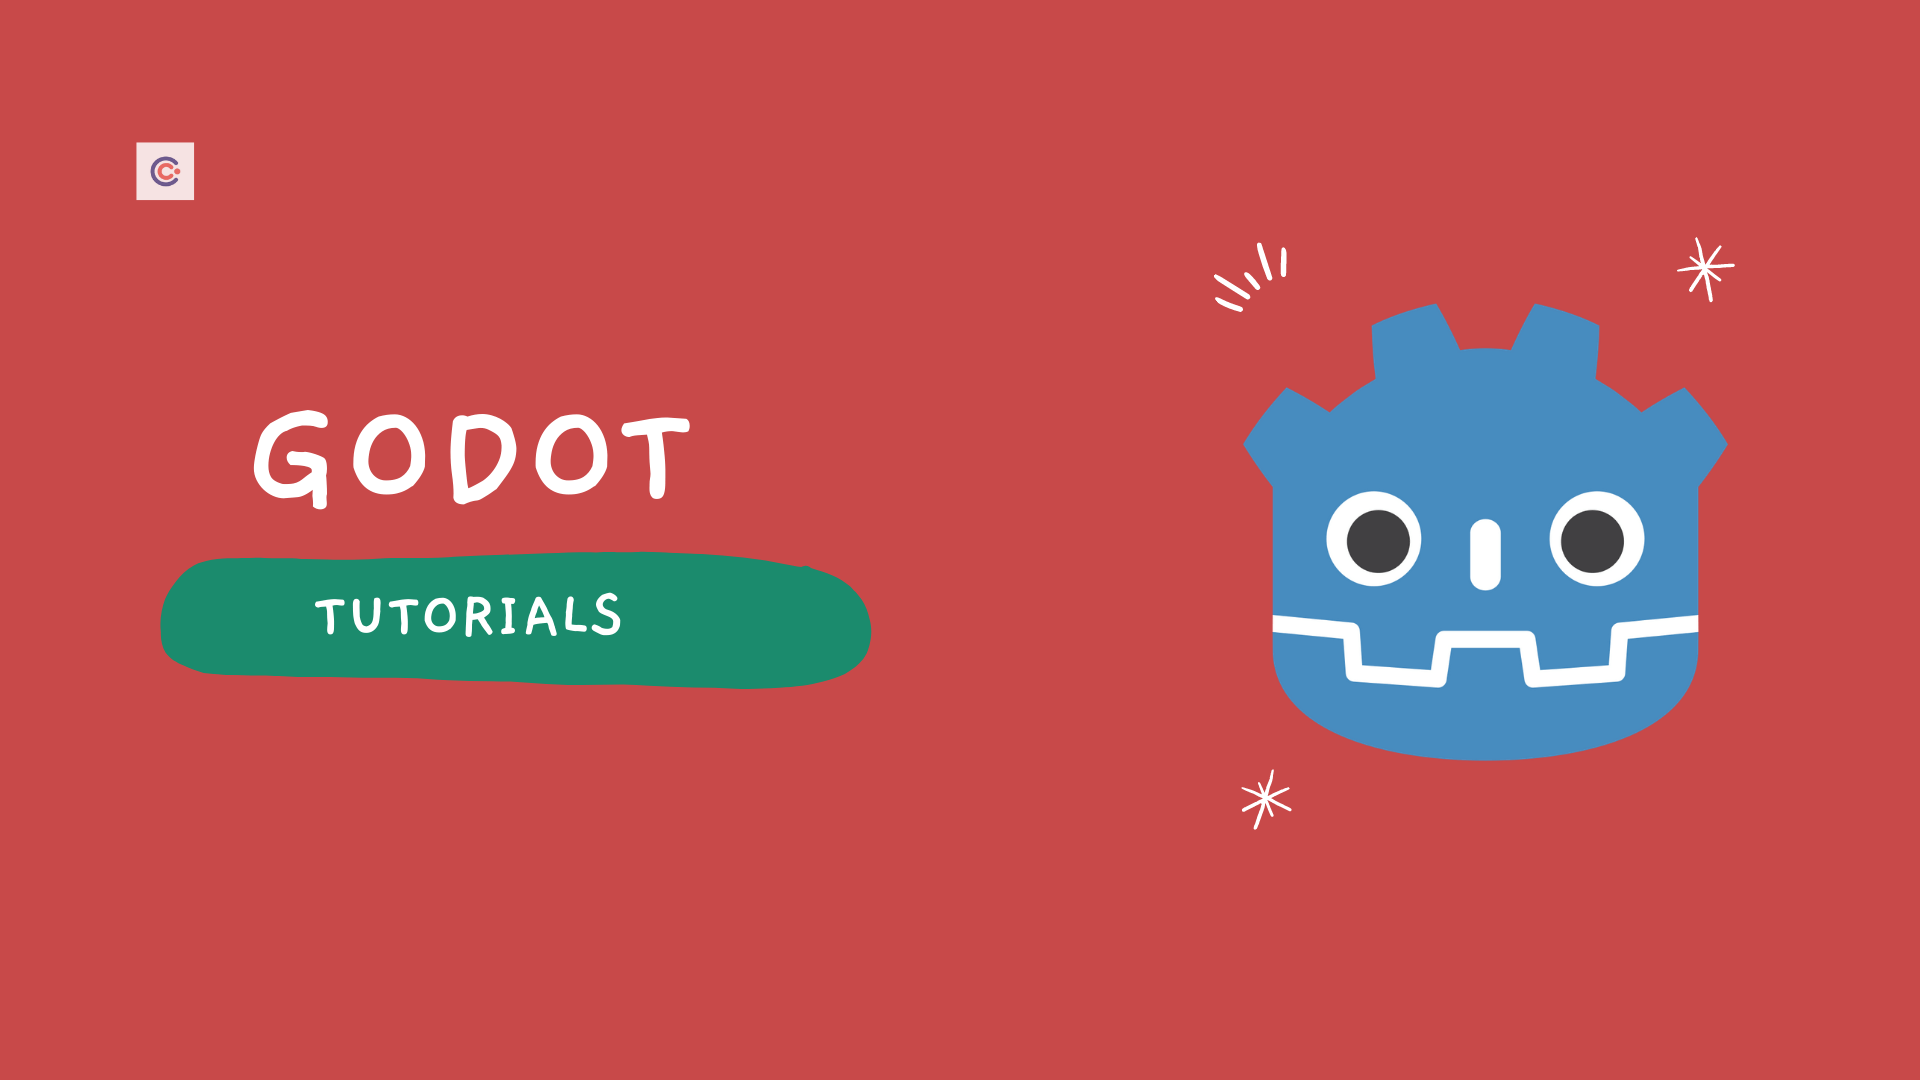 5 Best Godot Tutorials - Learn Godot Online